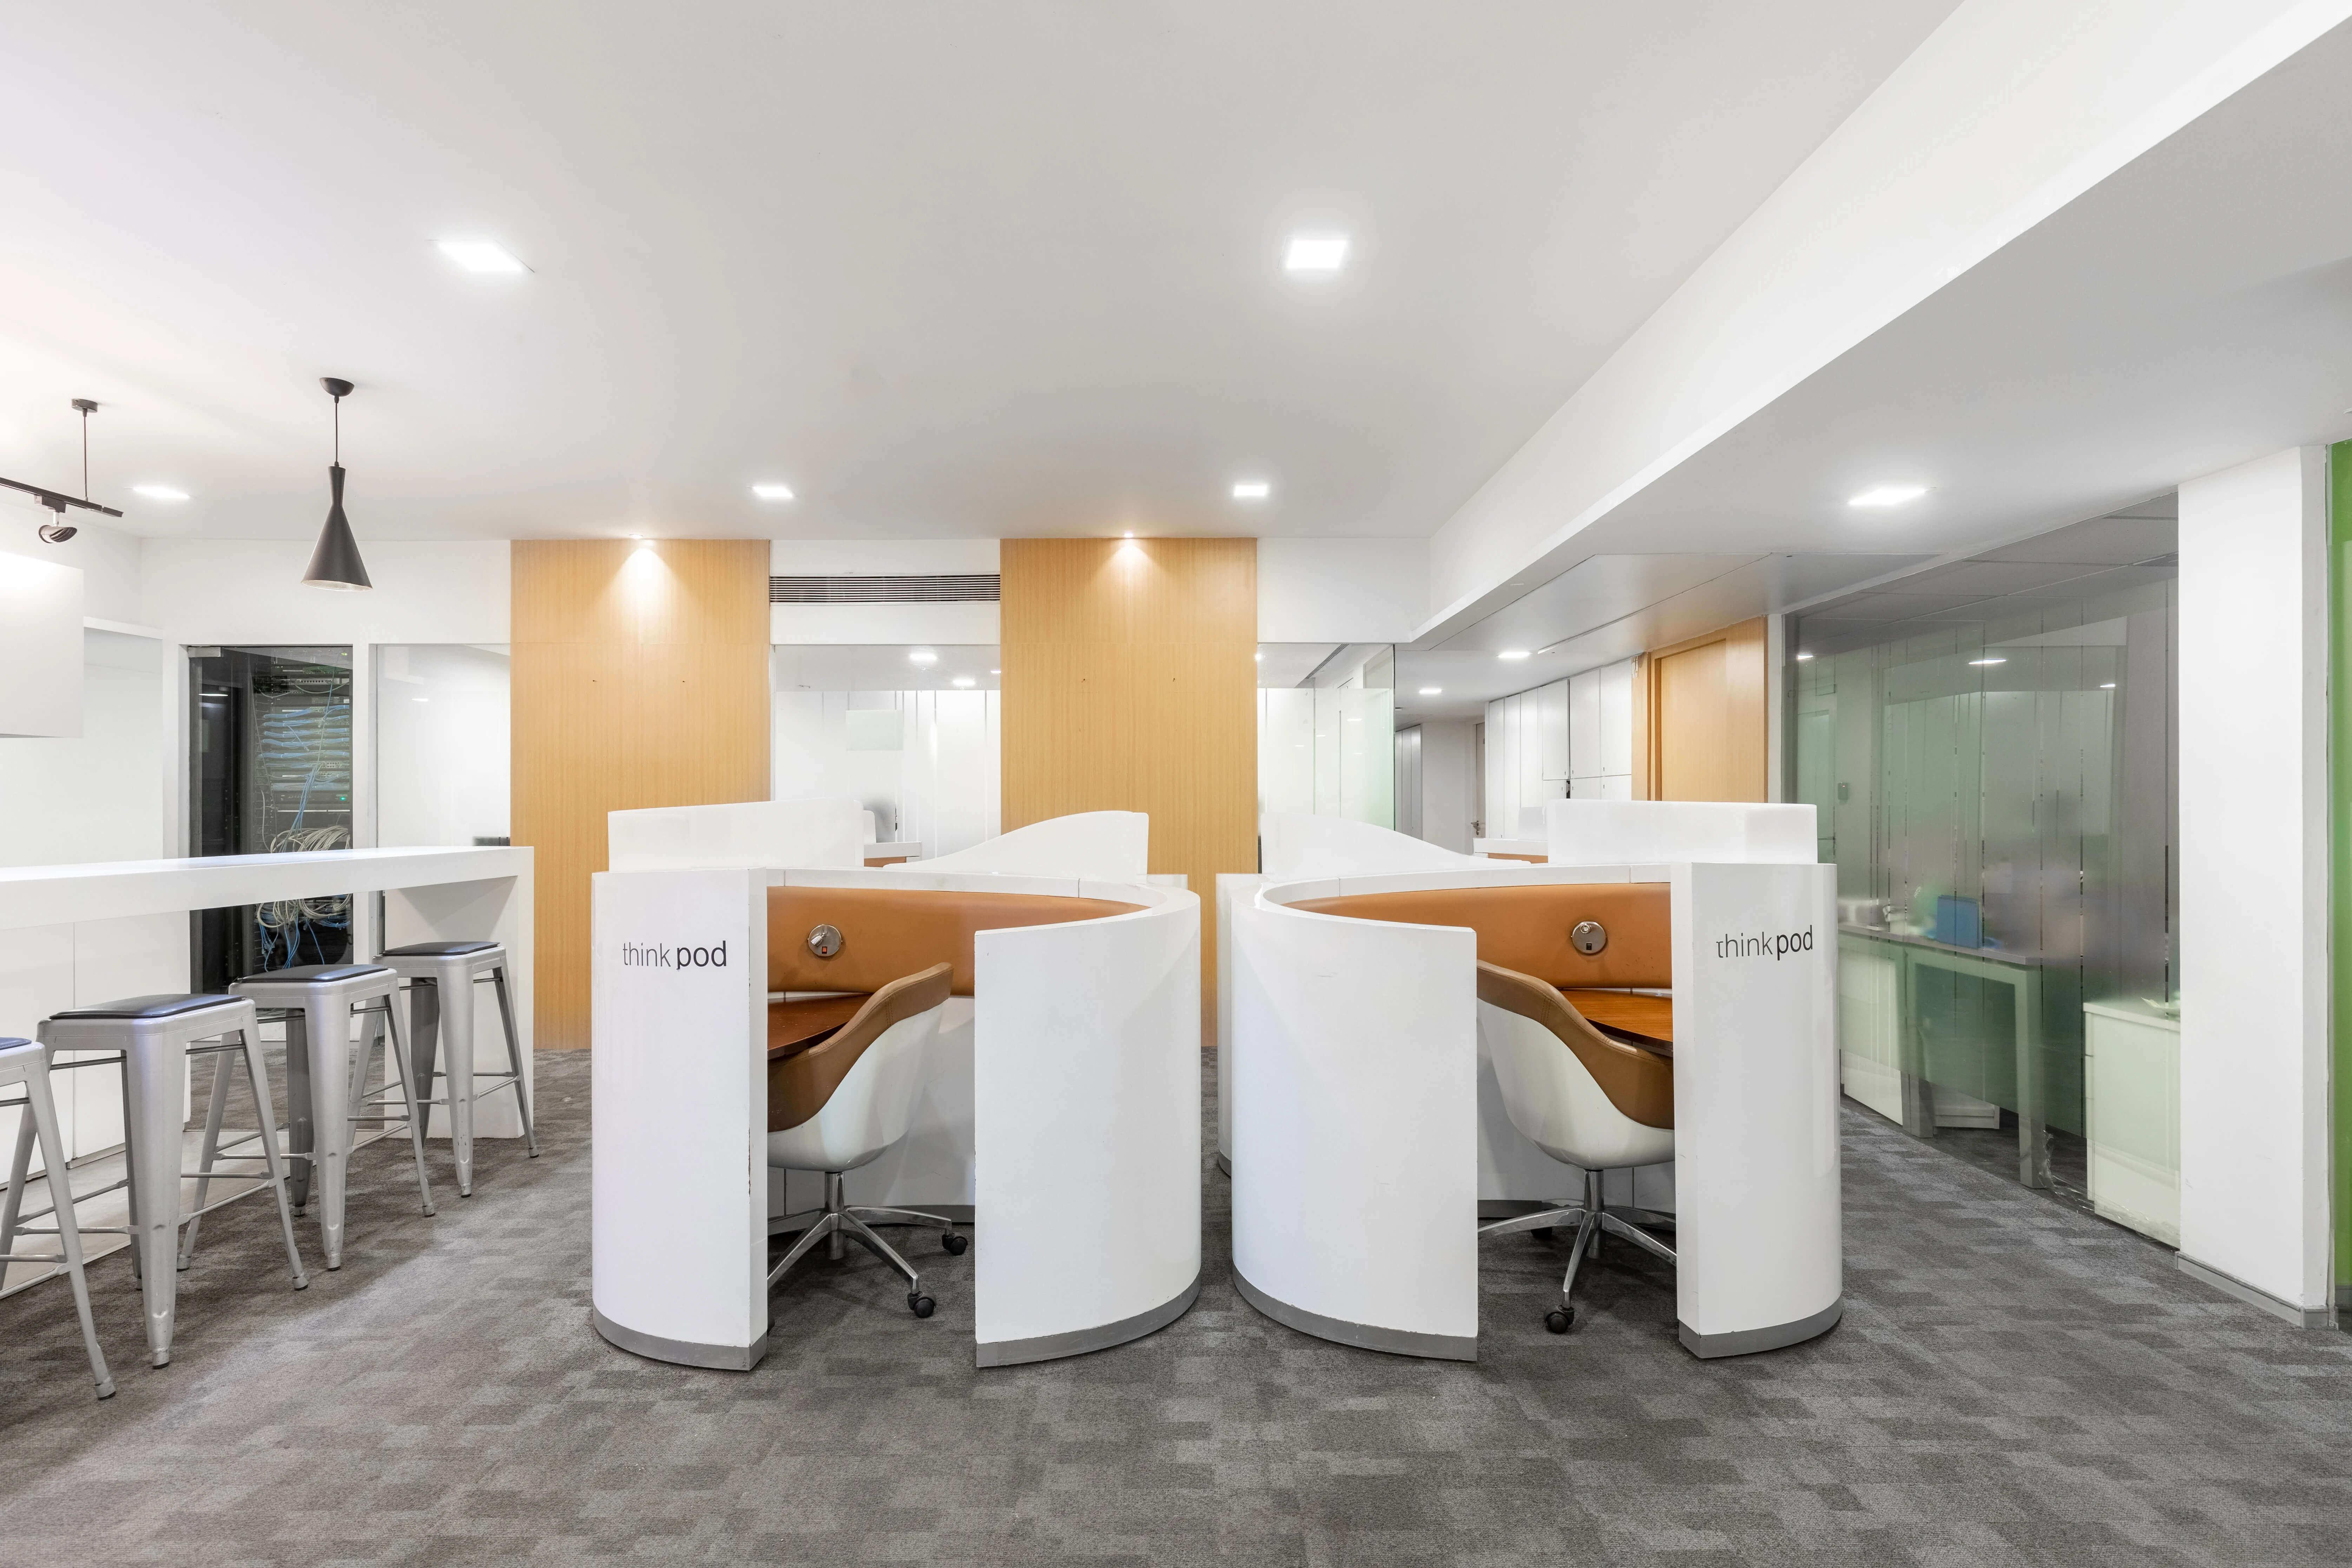 Regus Coworking Space in Indore